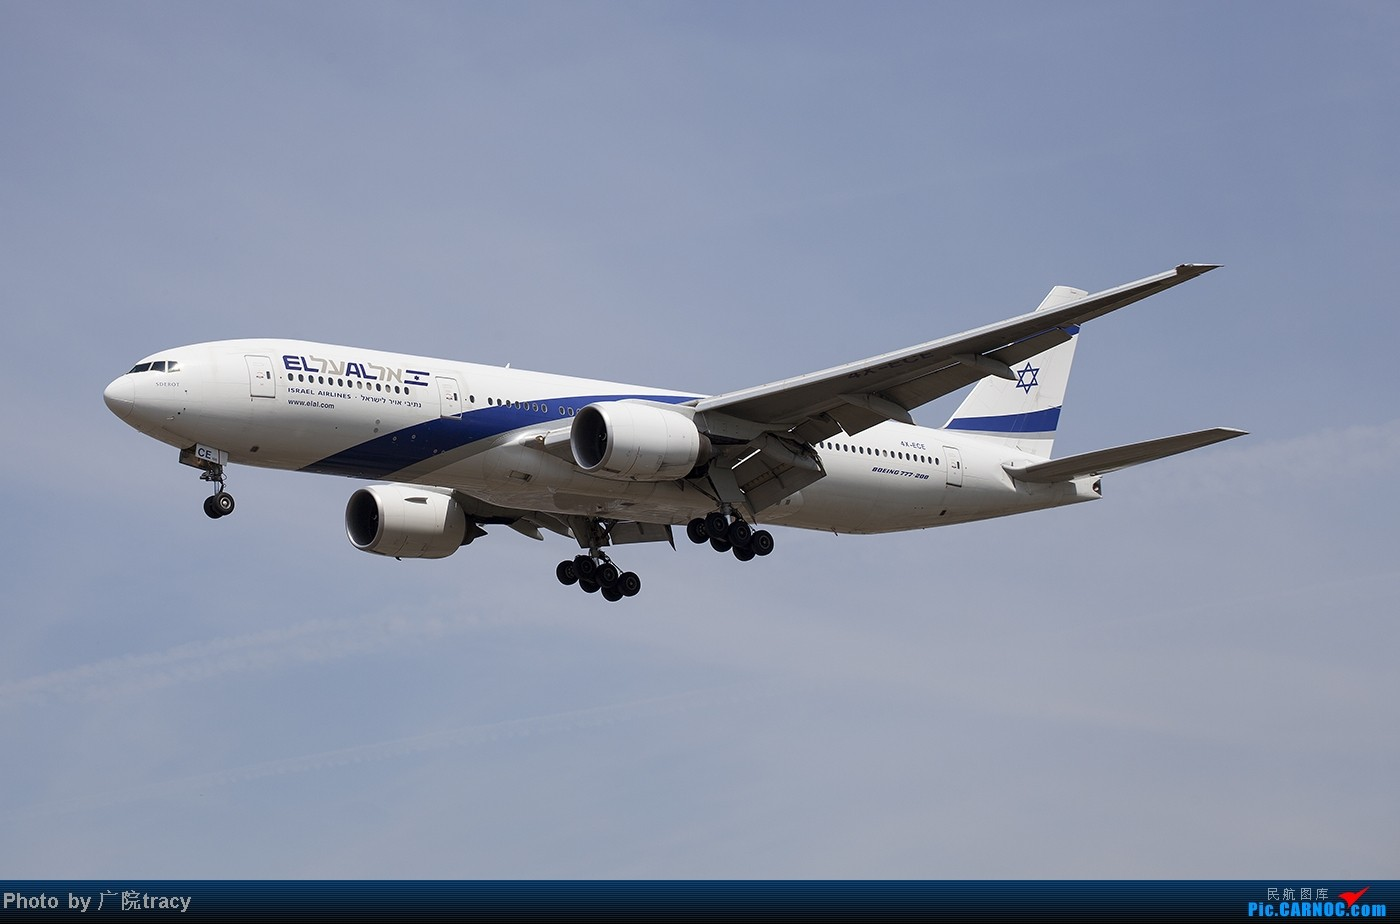 Re:[原创]★ ★ ★ ★ ★中东的航空公司在伦敦希斯罗国际机场  ★ ★ ★ ★ ★ BOEING 777-200ER 4X-ECE 英国伦敦希思罗机场